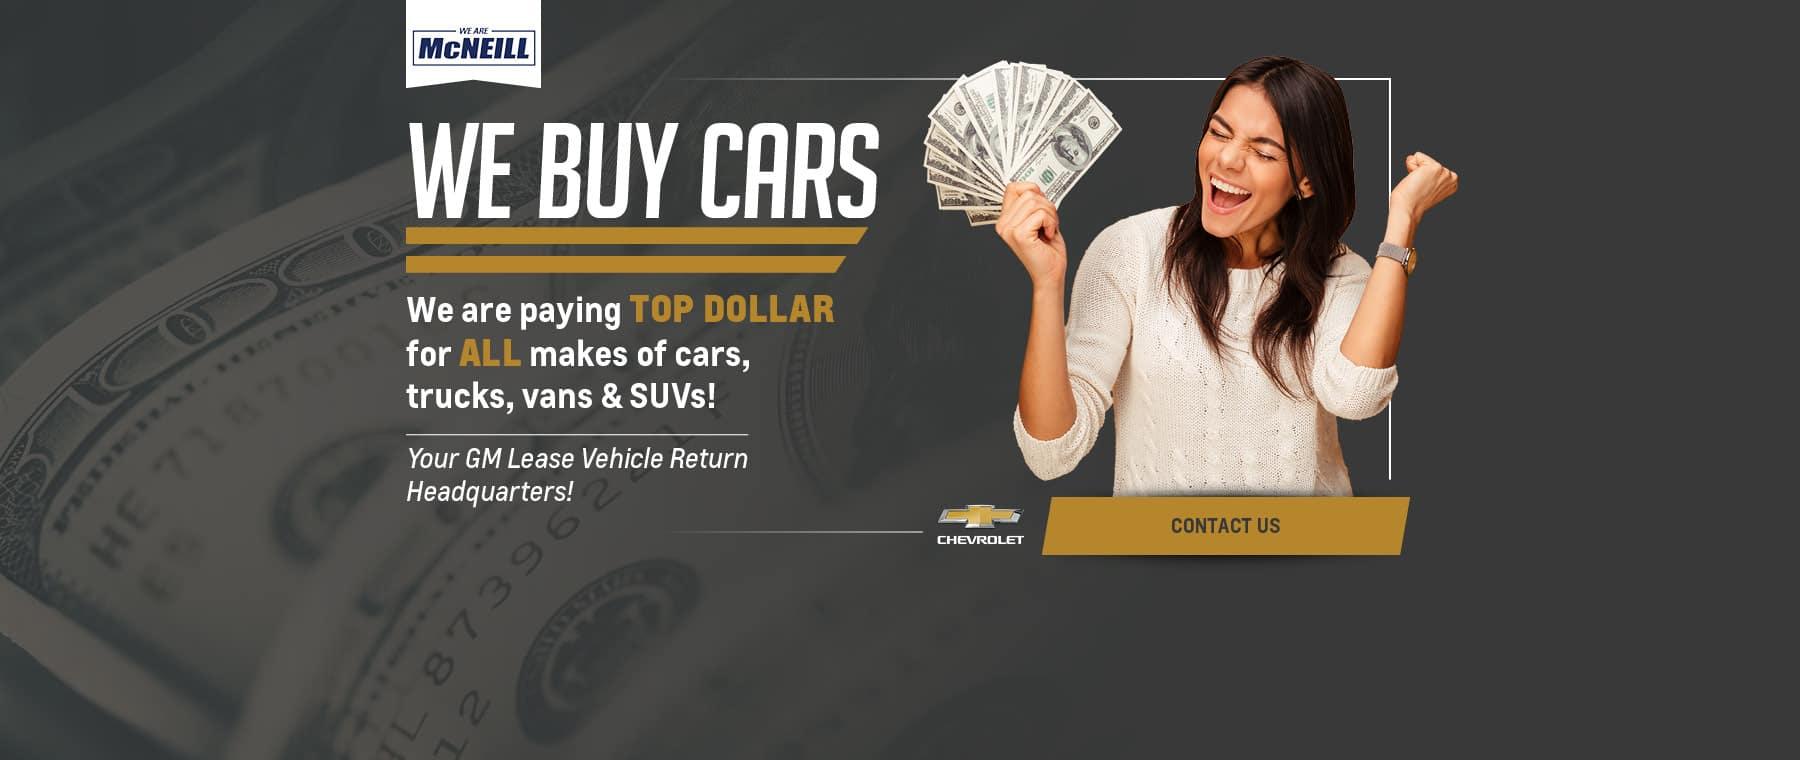 2021-06-mcneillchevroletbuick-10430697-We-Buy-Cars-SL